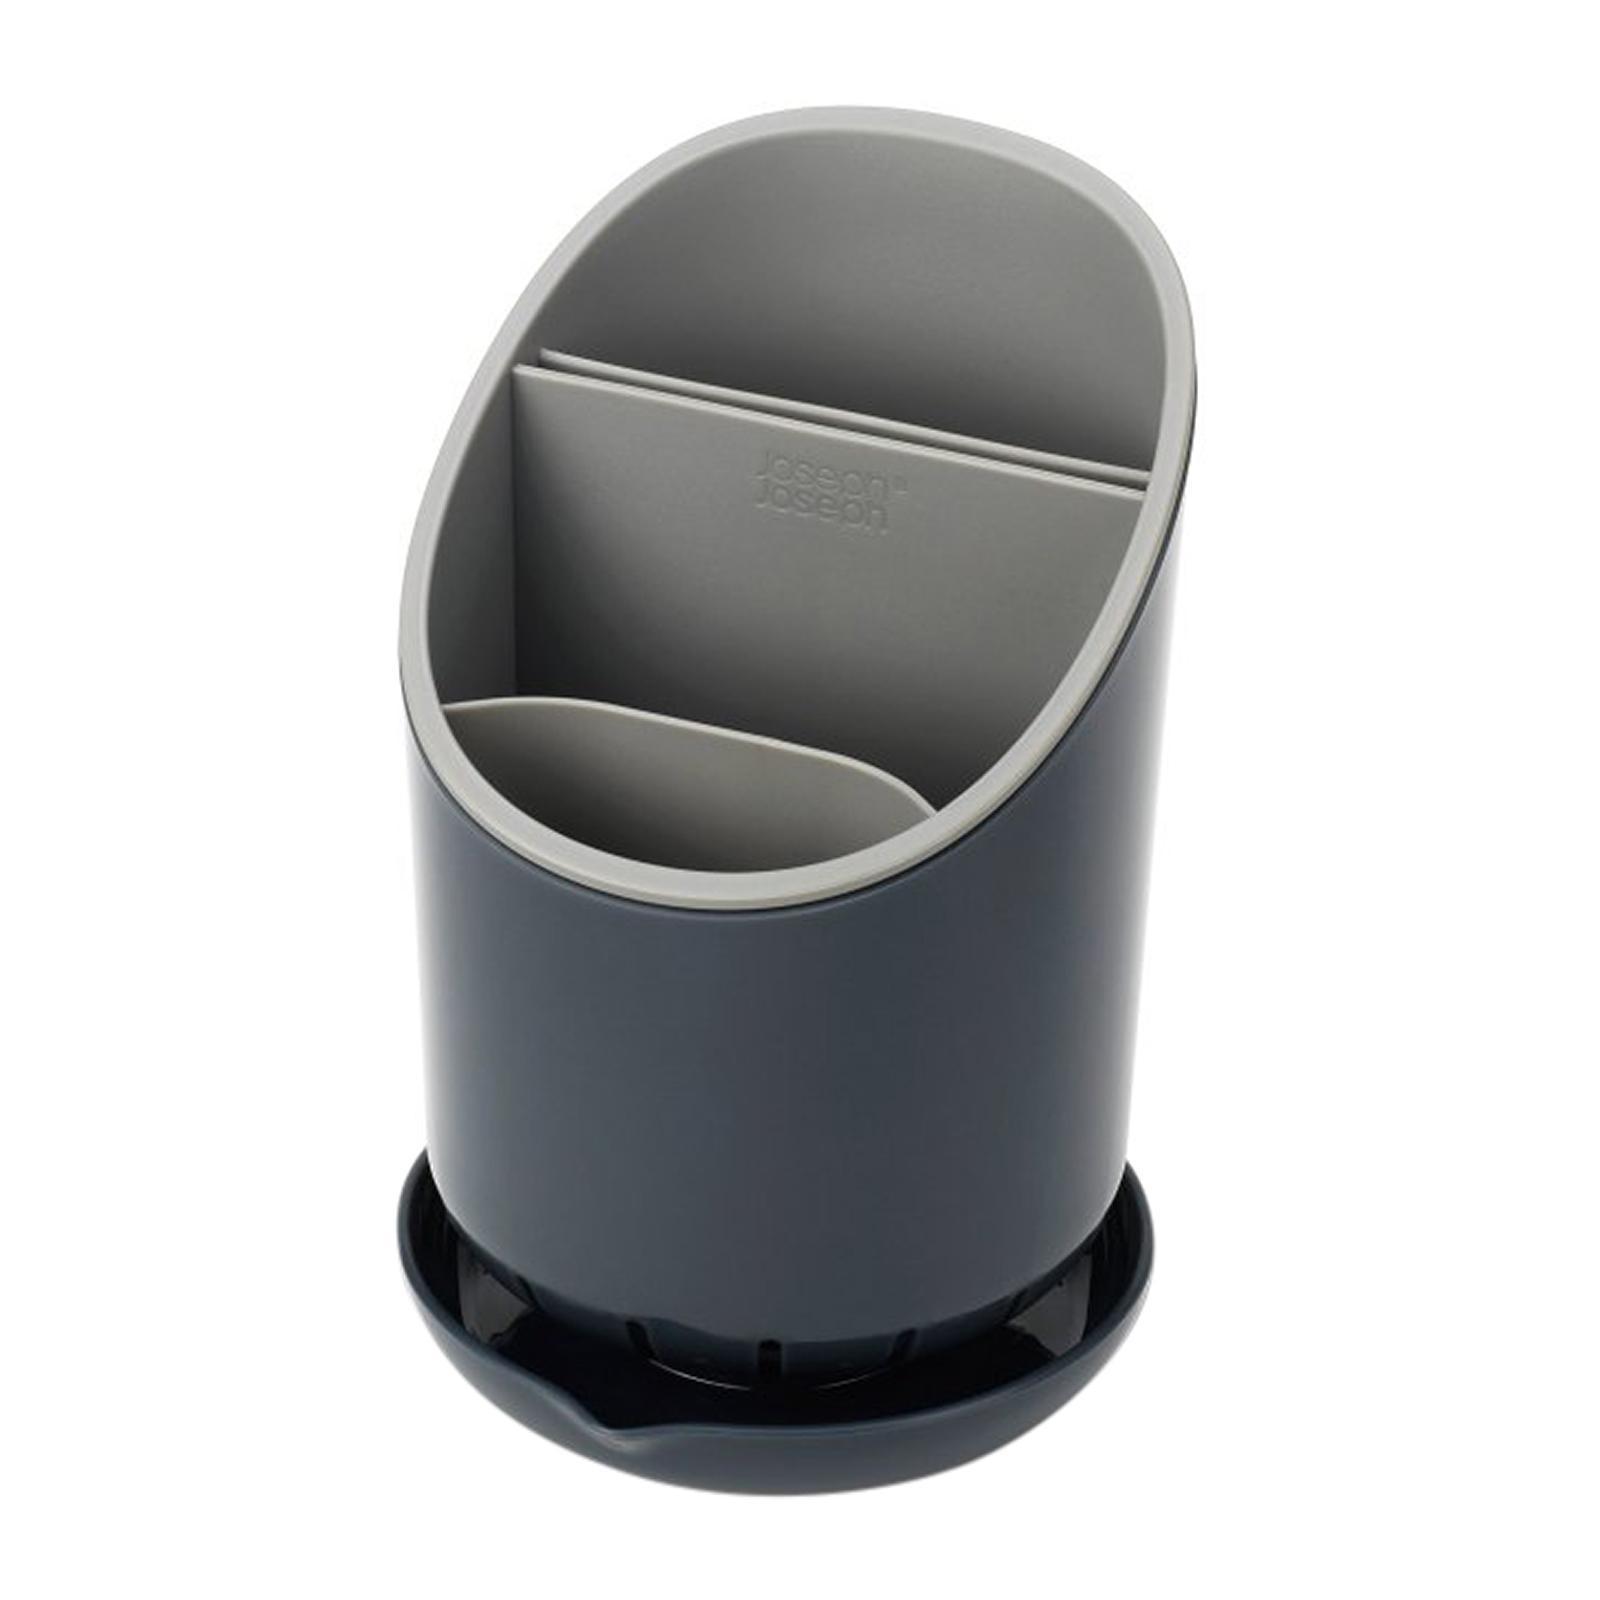 Joseph Joseph Dock - Dk. Grey/Grey (121x188x127mm) - Cutlery Drainer